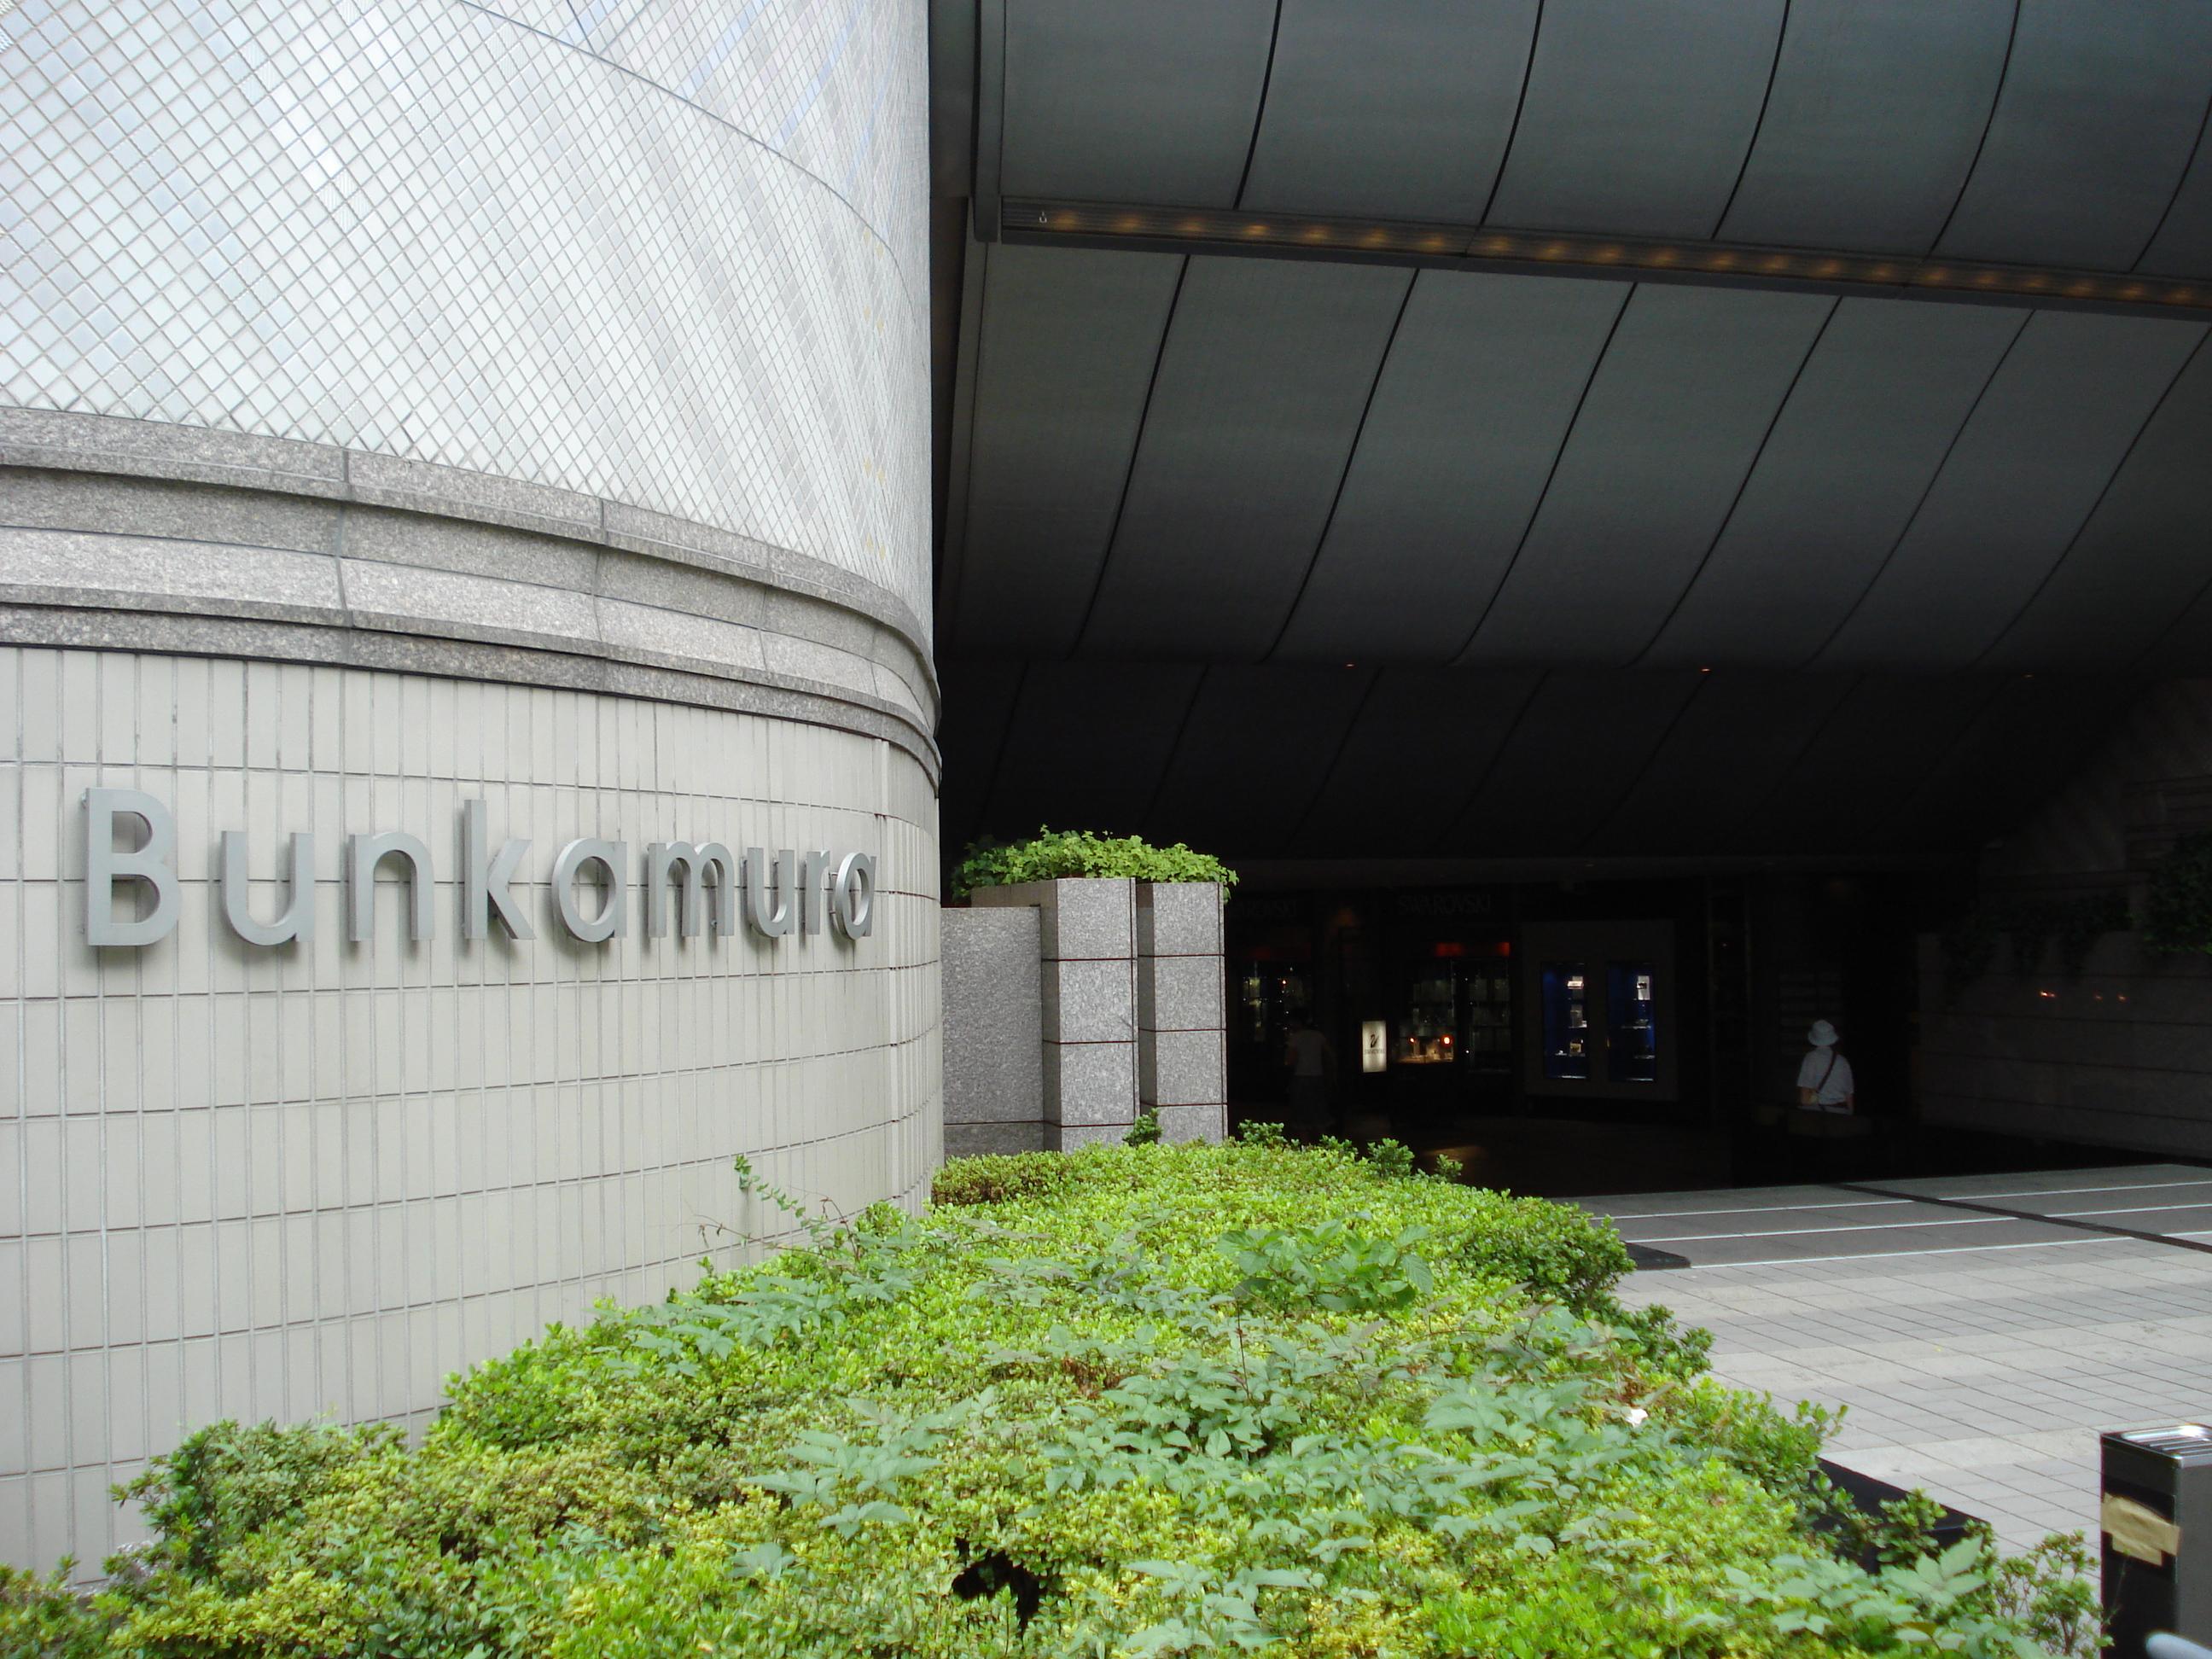 https://upload.wikimedia.org/wikipedia/commons/f/fe/Bunkamura.JPG